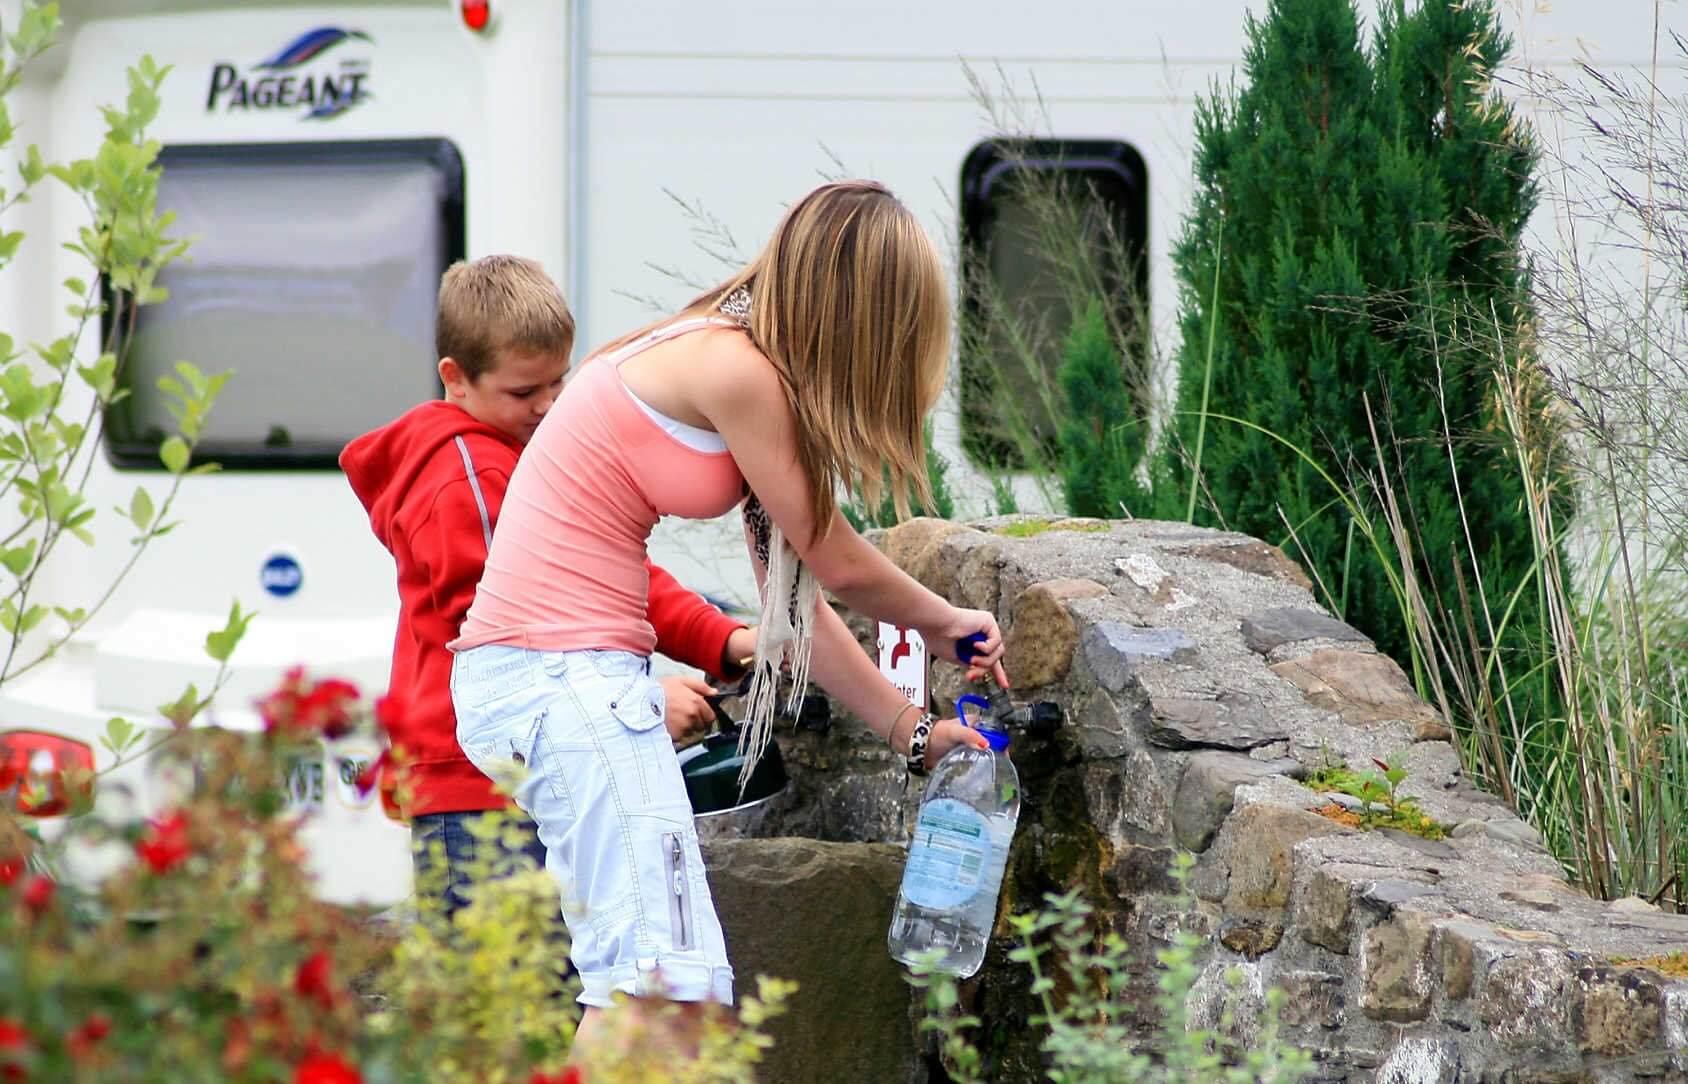 Erwlon Caravan & Camping Park, Llandovery, Carmarthenshire | Head Outside